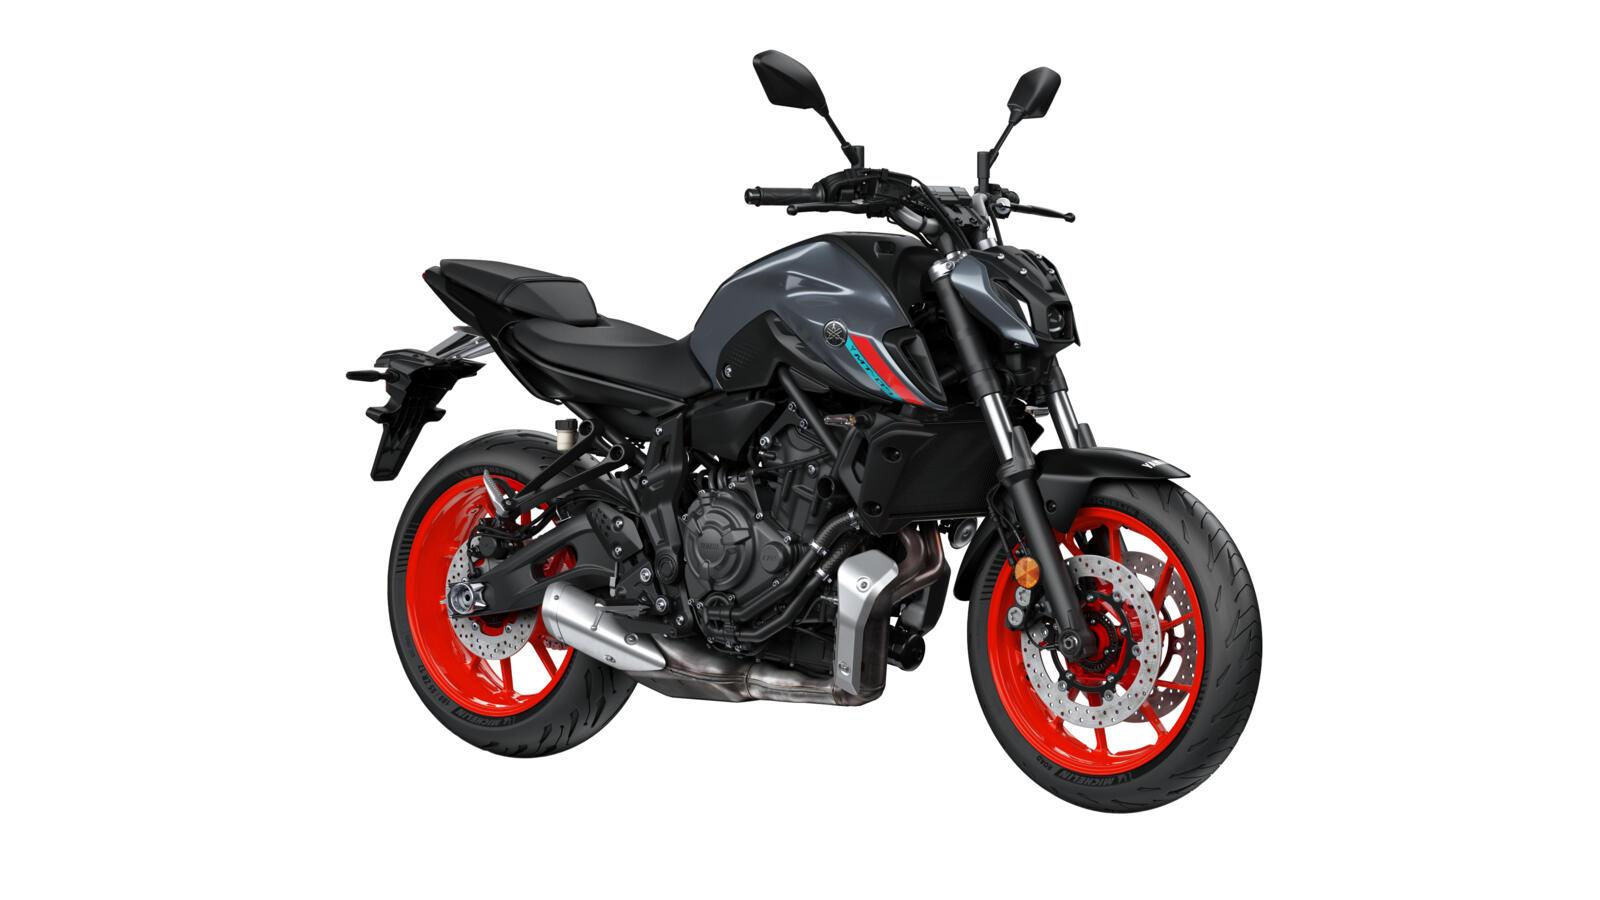 Yamaha-MT-07-my2021-30